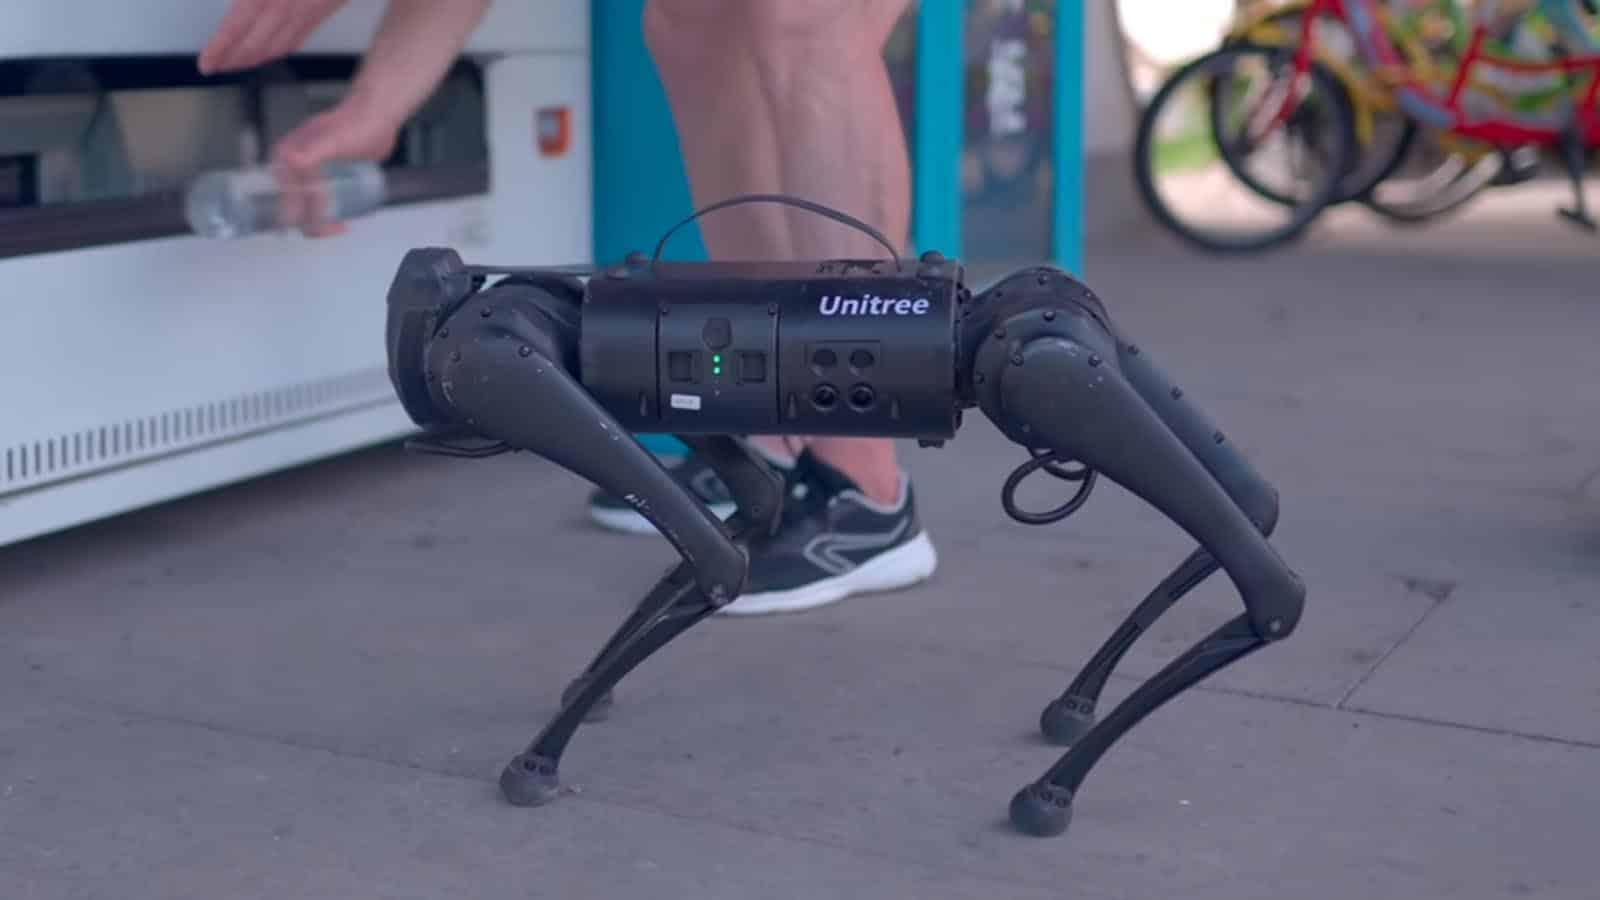 unitree robotic dog